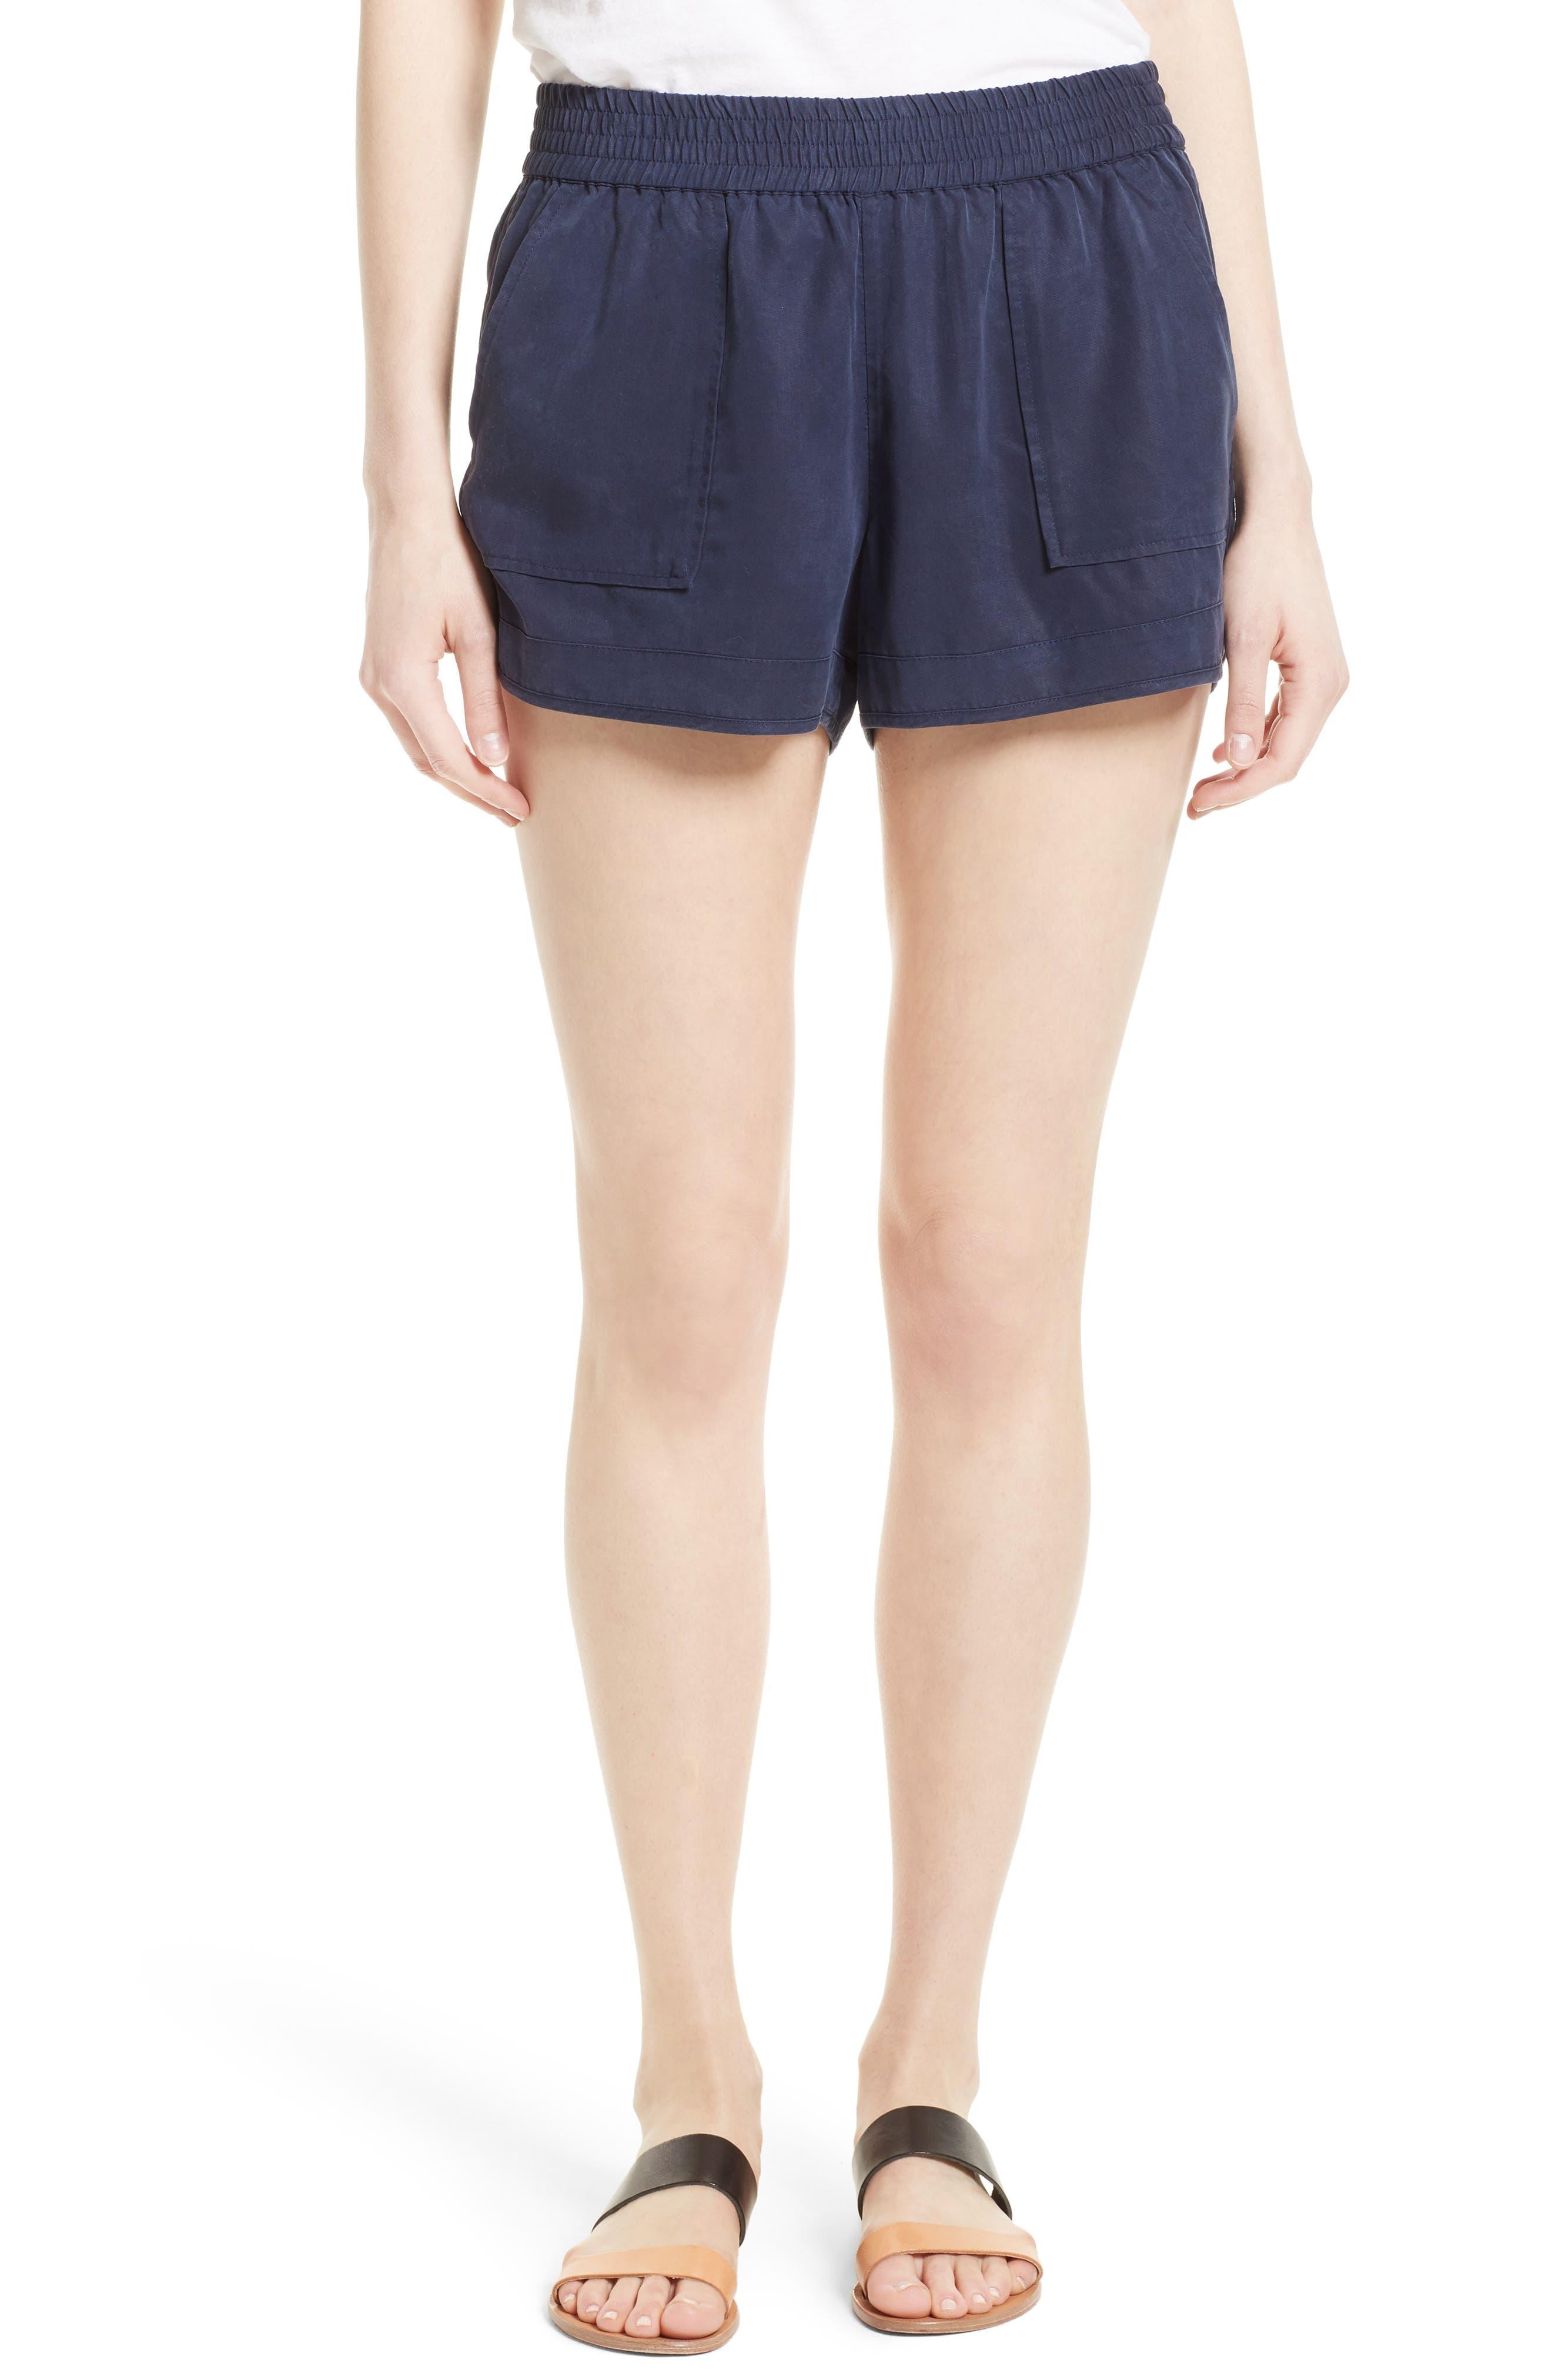 Beso Woven Shorts,                         Main,                         color, Dark Navy